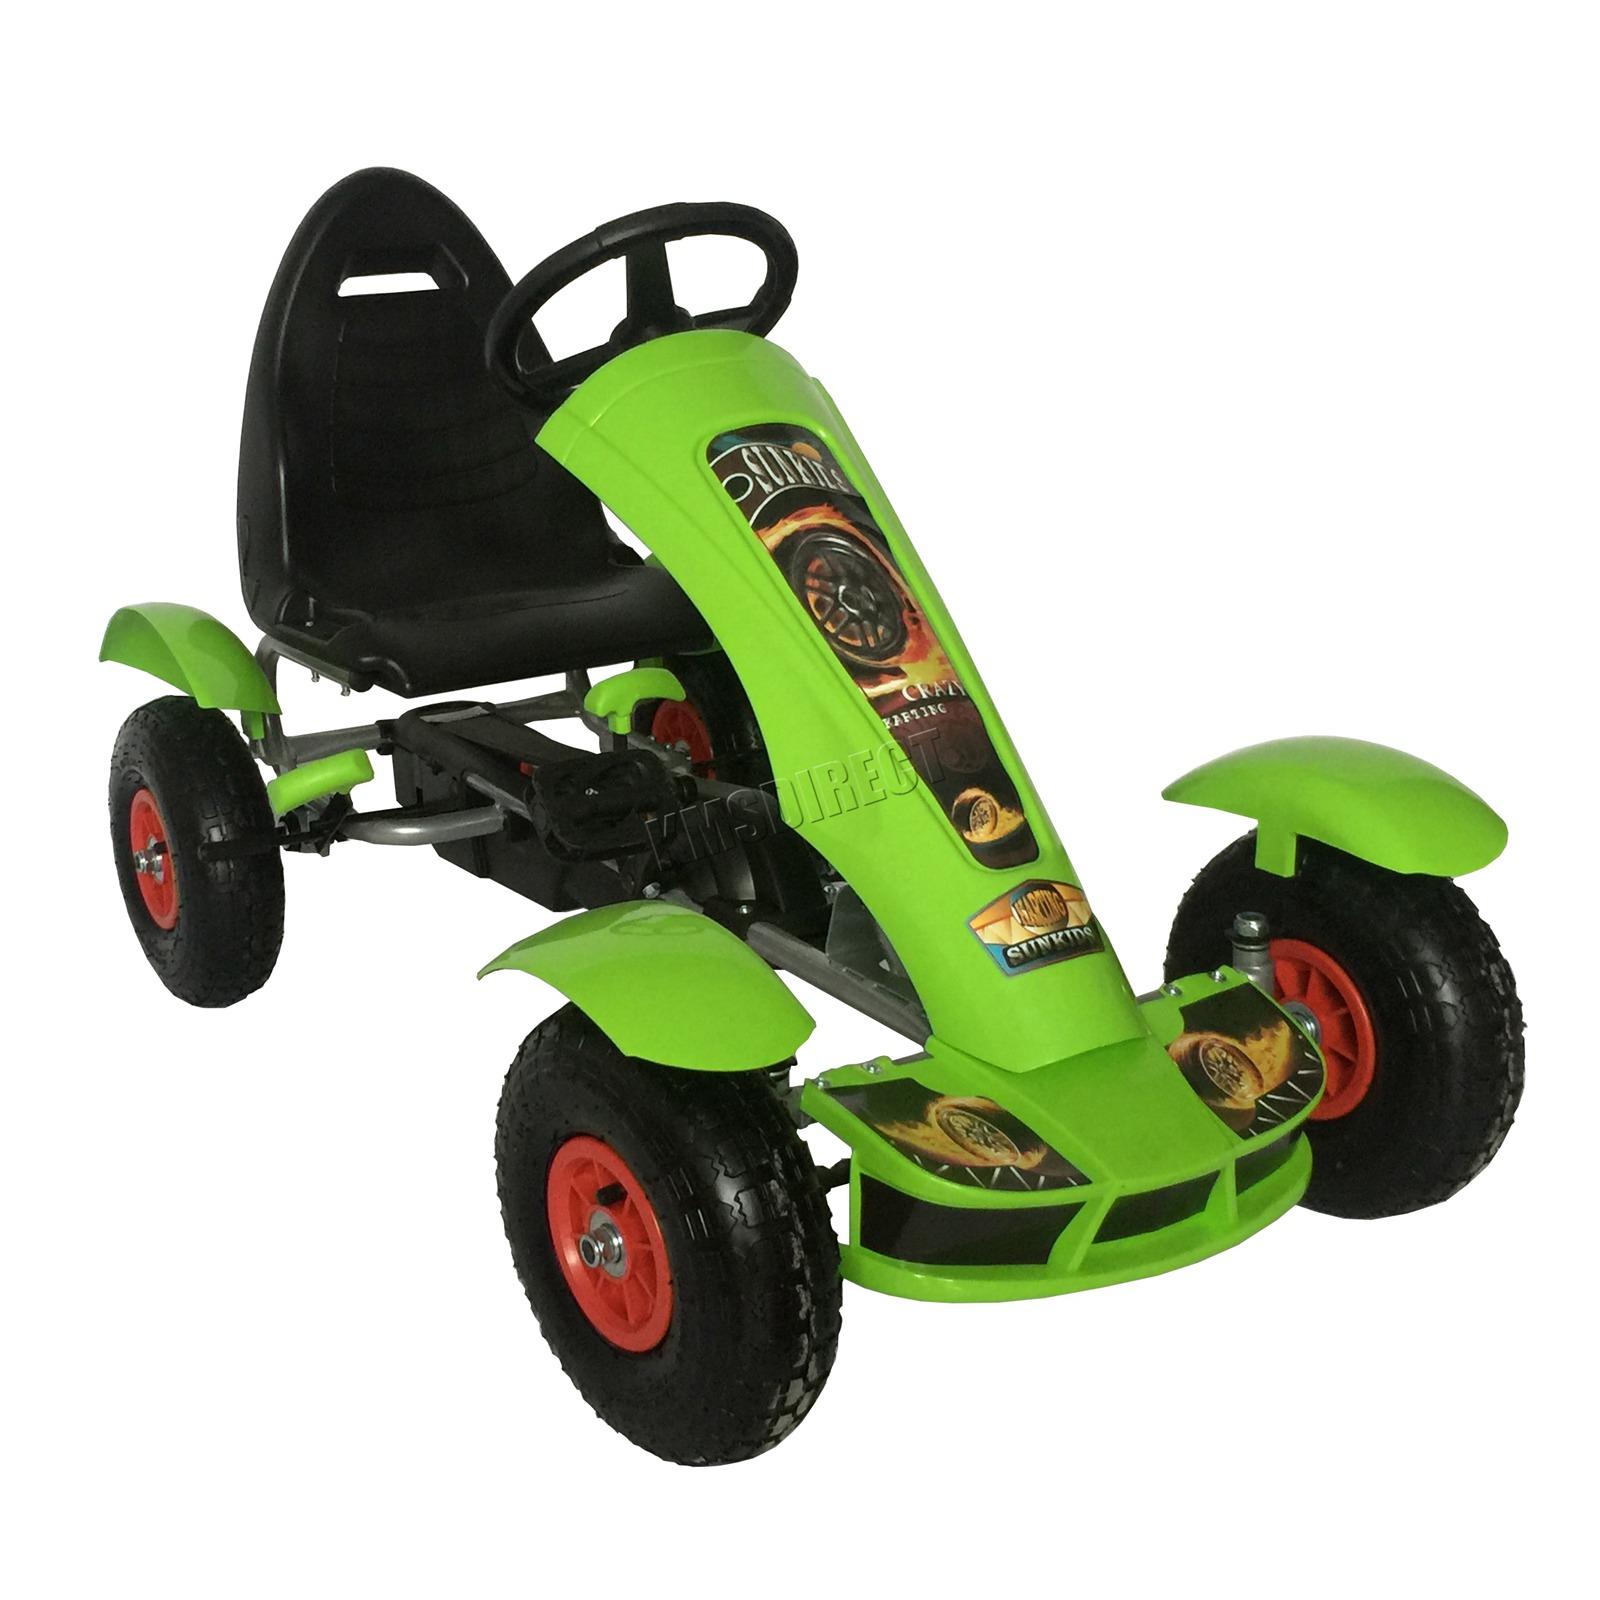 201701719267 2475 I 276 27 GOKART FH G03 GREEN KMSWM033 - Foxhunter Infantil Go Kart – Pedal Coche para Niños Gocart con Freno de Mano G03